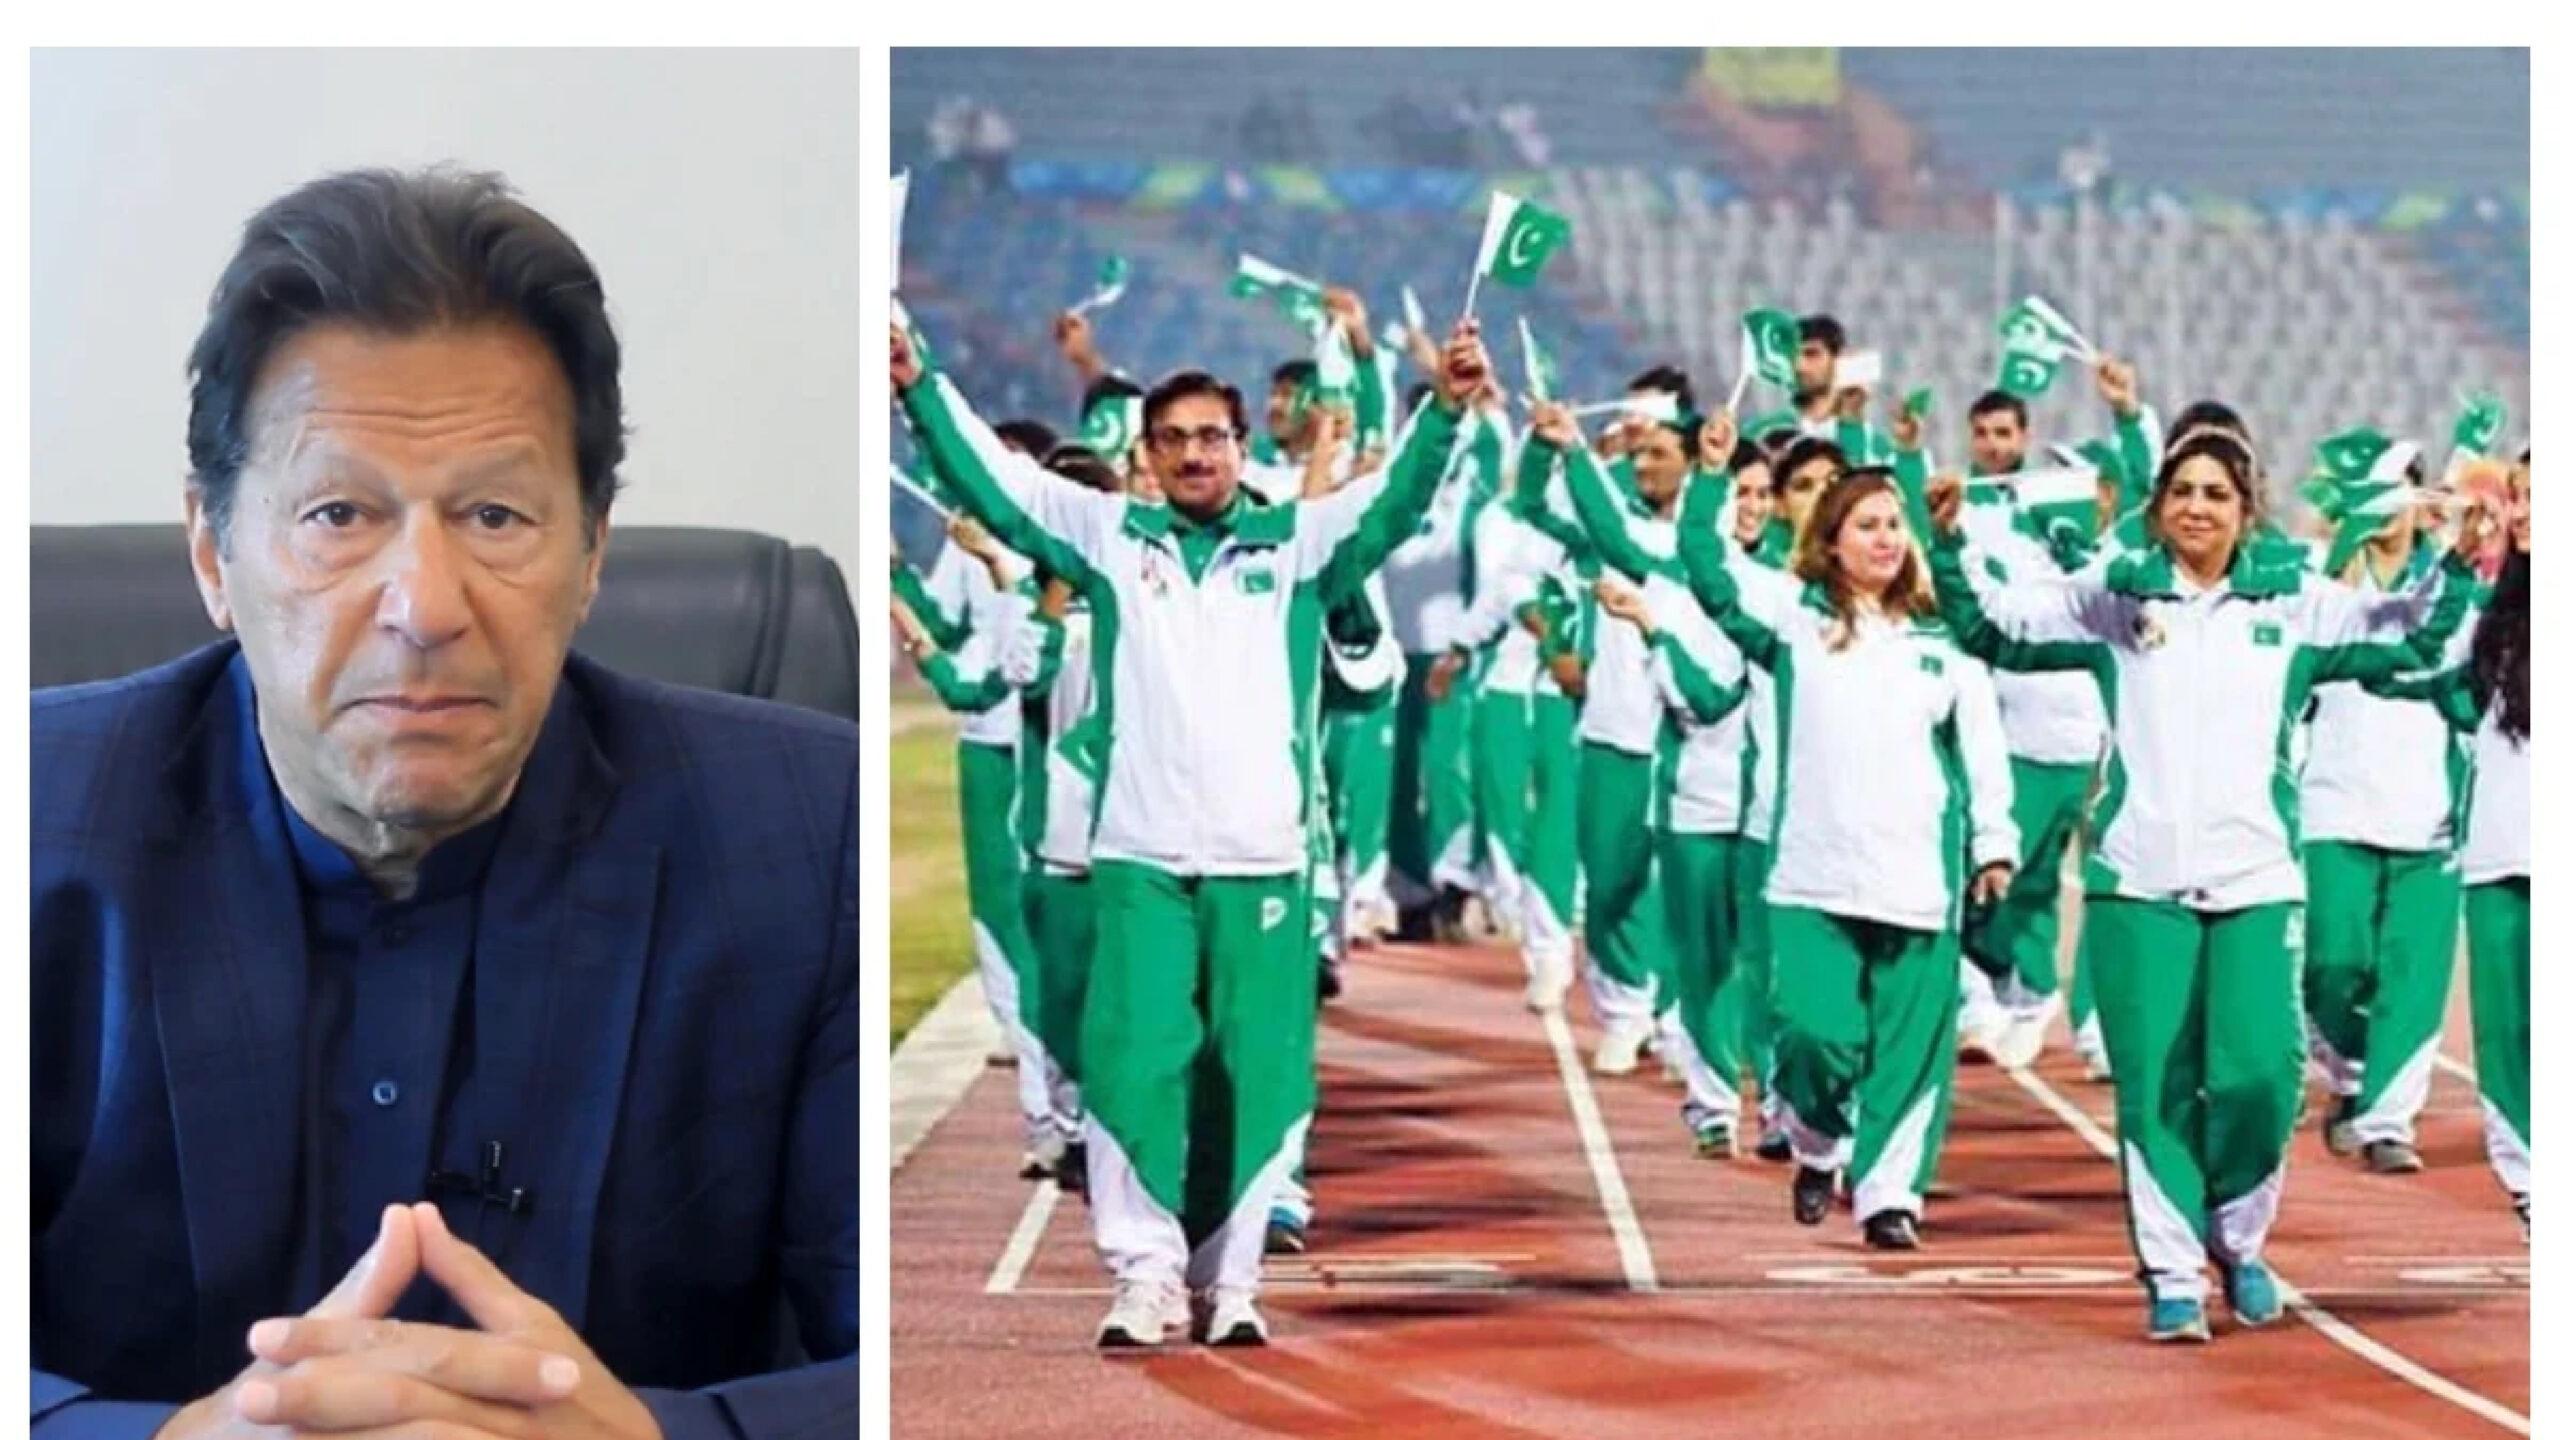 Pakistans-national-sports